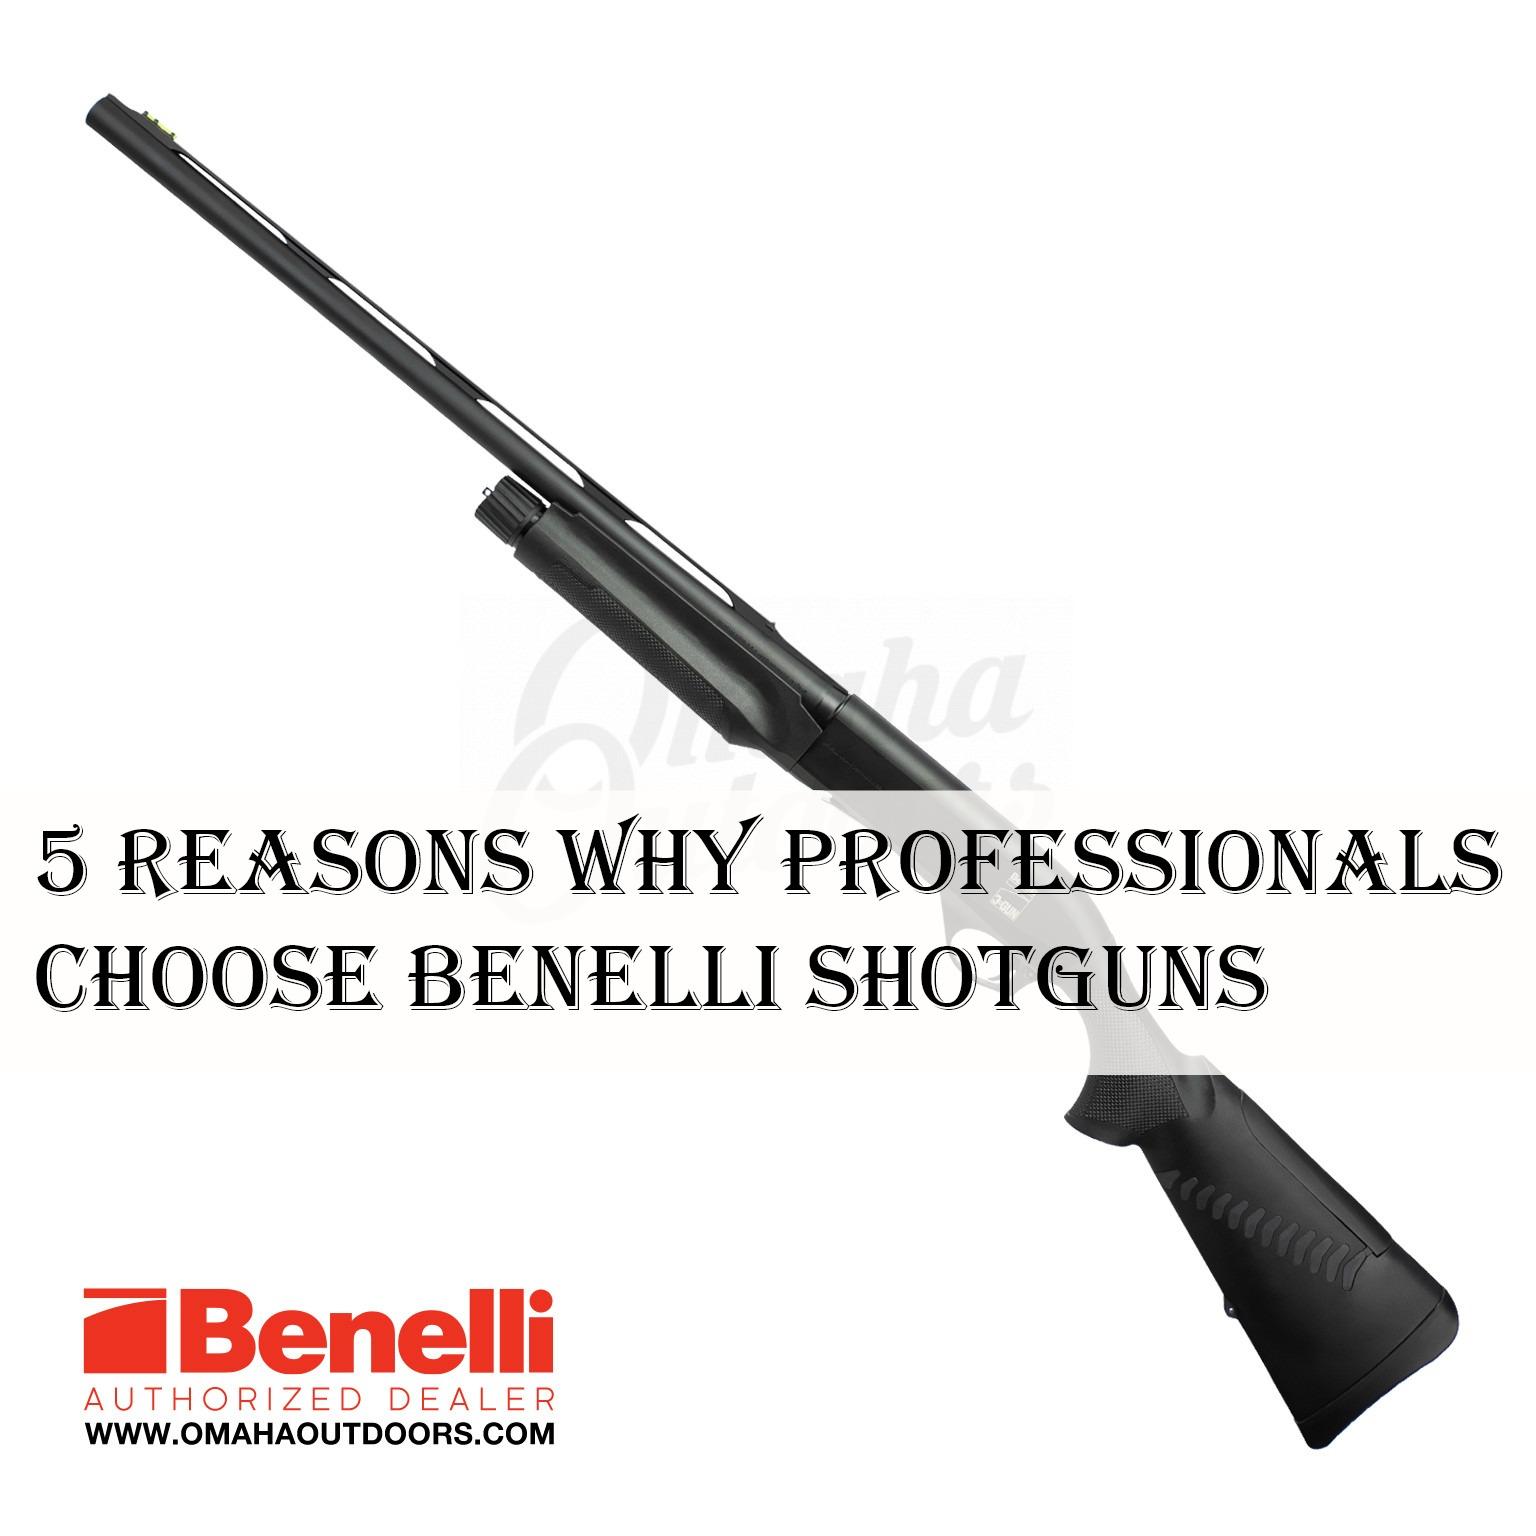 5 Reasons Why Professionals Choose Benelli Shotguns